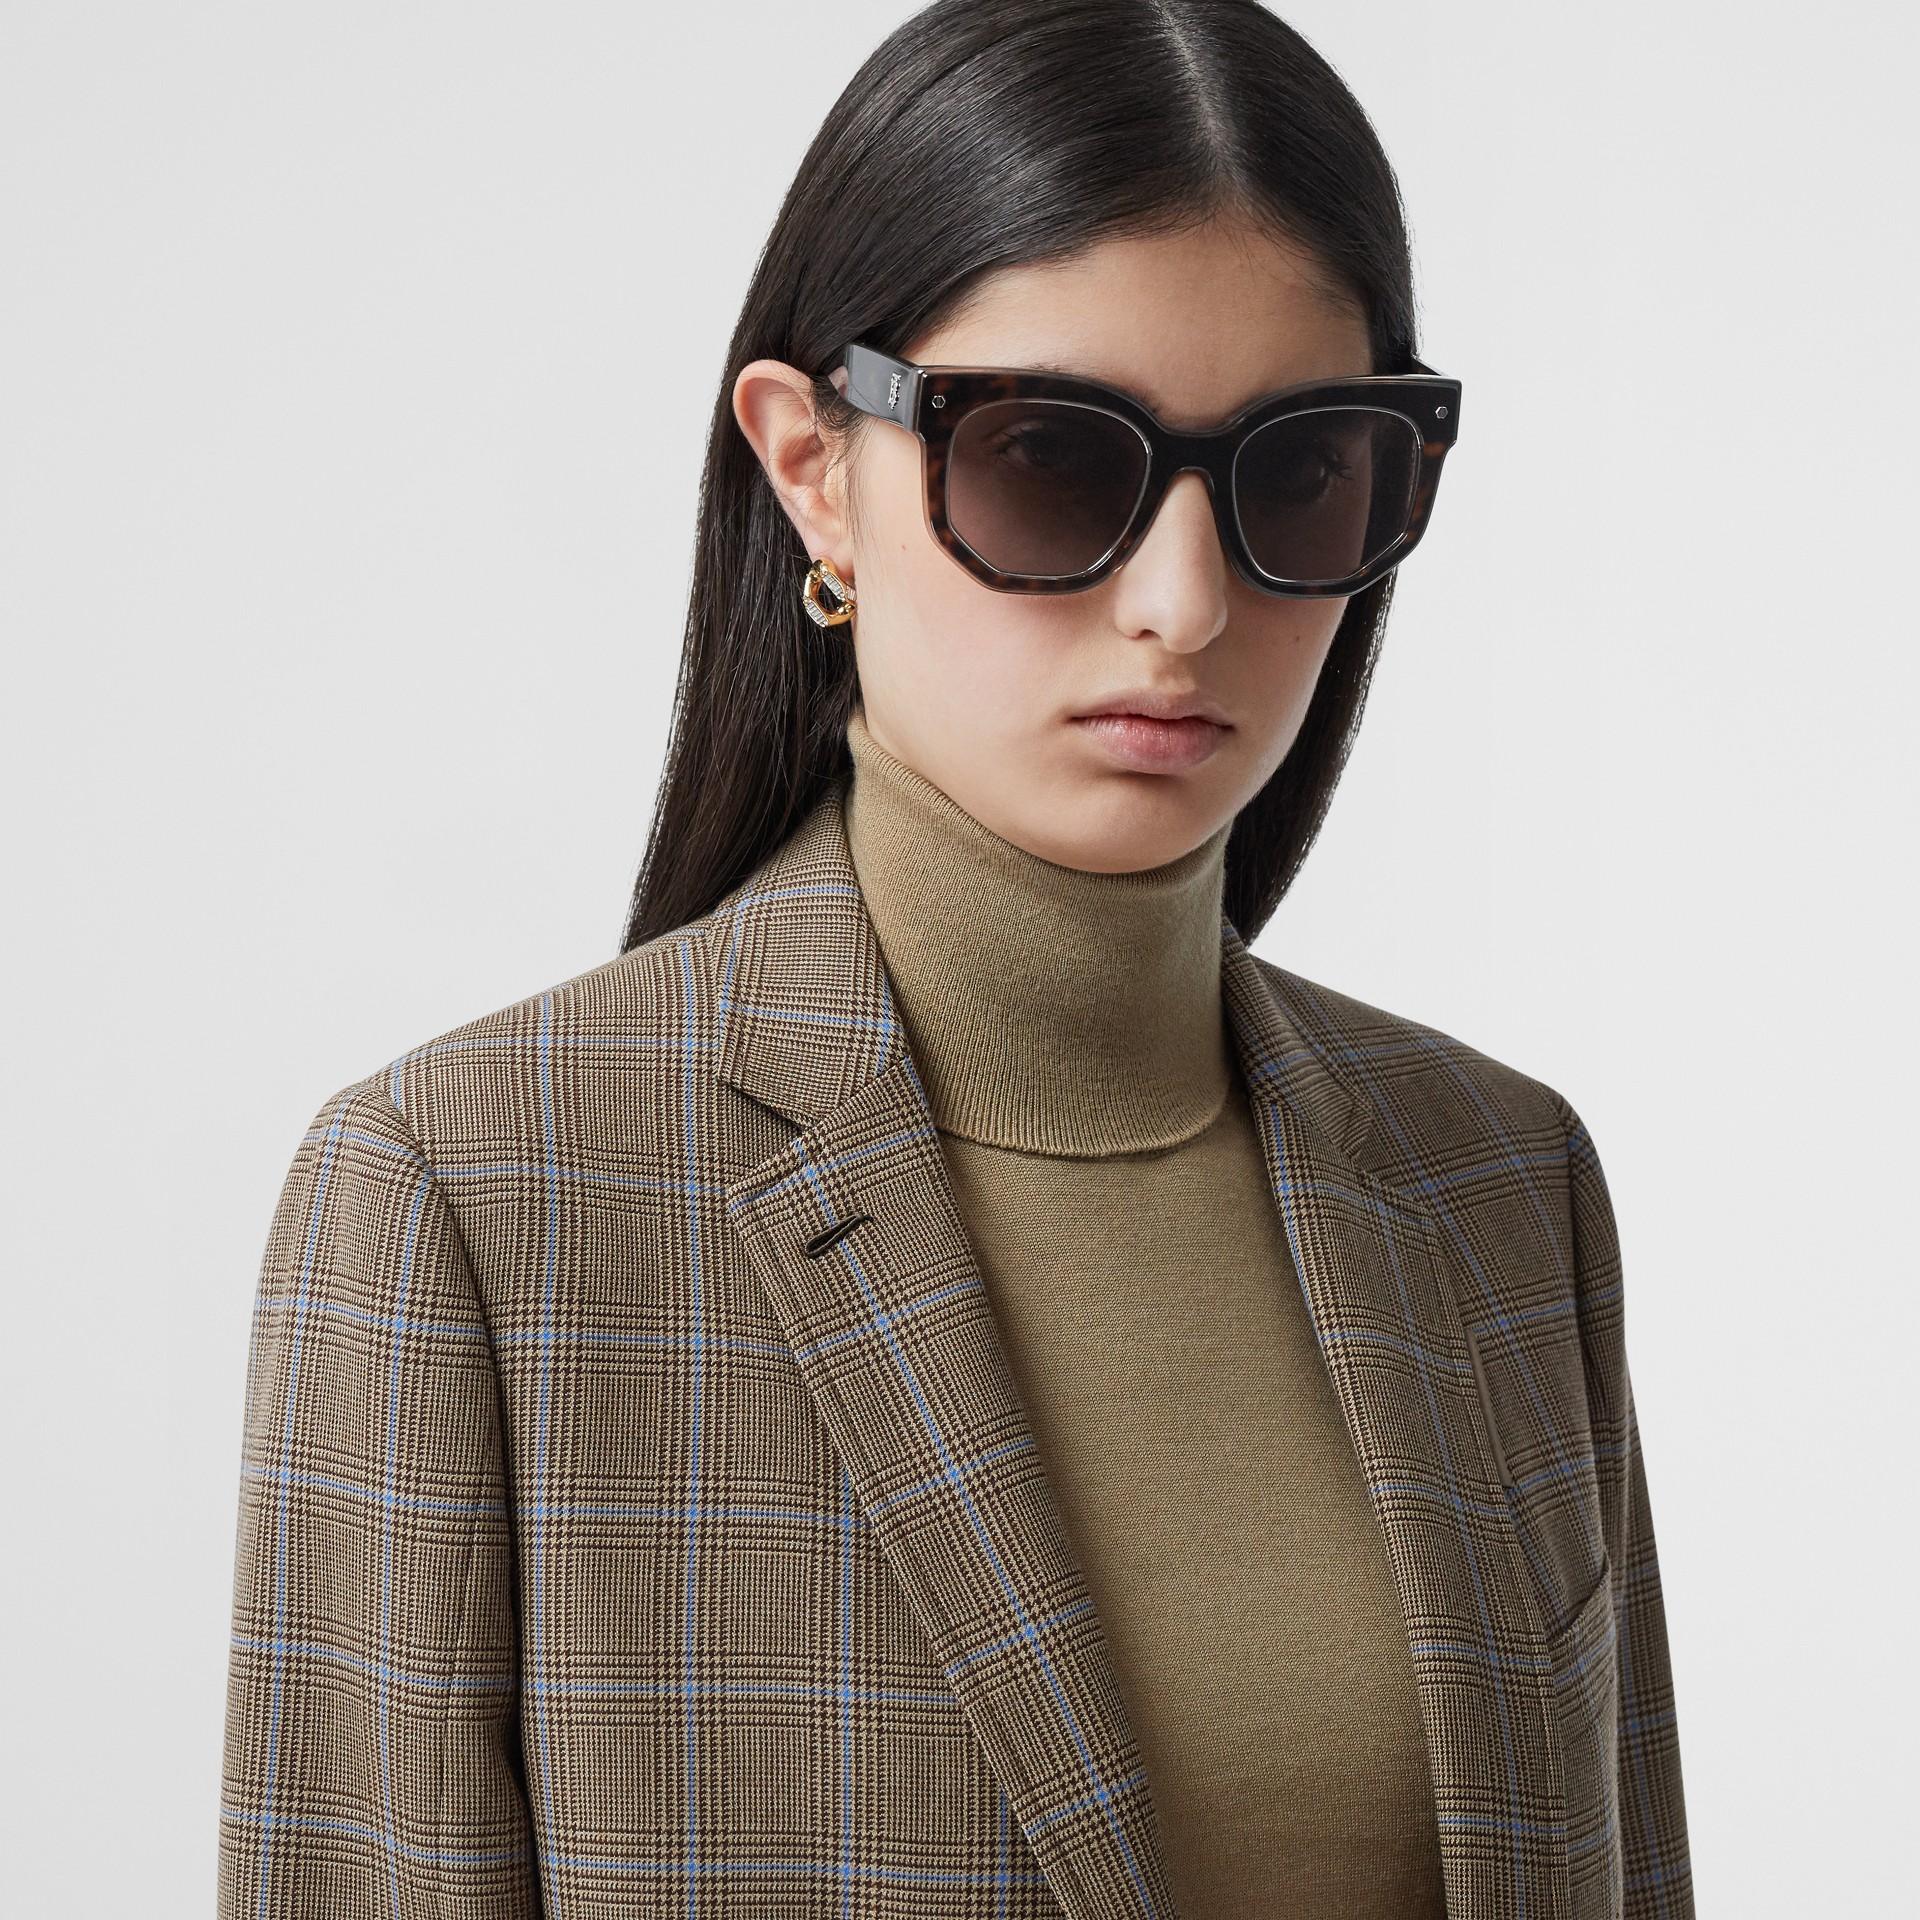 Geometric Frame Sunglasses in Tortoiseshell - Women | Burberry United Kingdom - gallery image 2